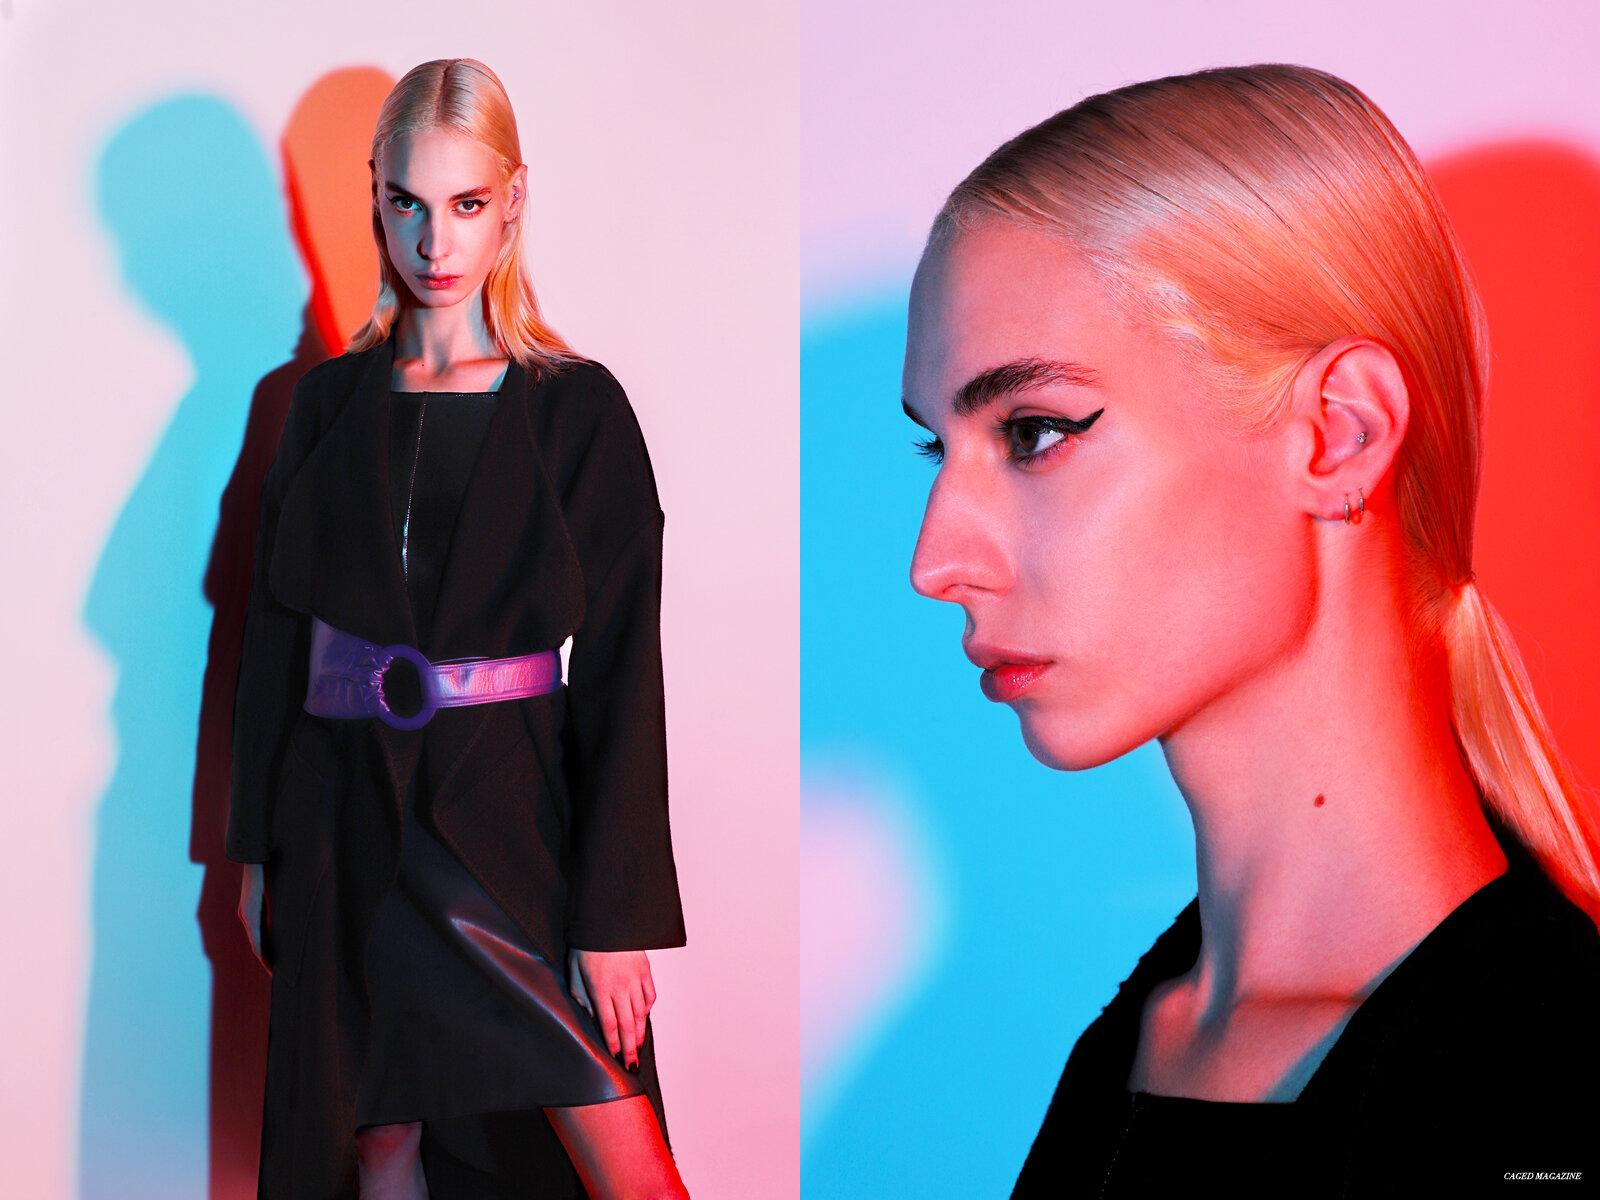 The Hampton Coat by  Noon By Noor,  Black Leather Dress by  Maison Marie Saint Pierre,  Purple Belt by  Lisa Shaub